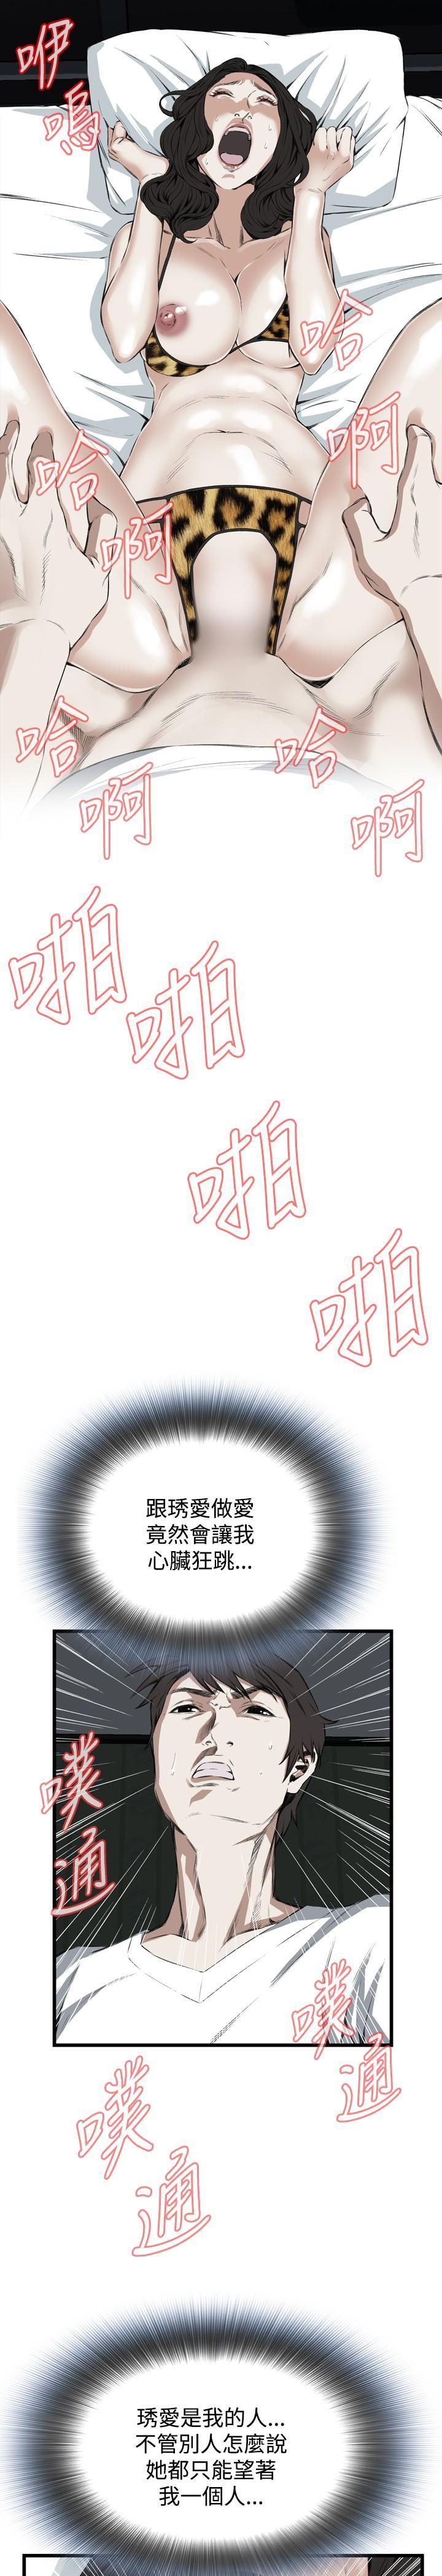 Take a Peek 偷窥 Ch.39~60 [Chinese]中文 450